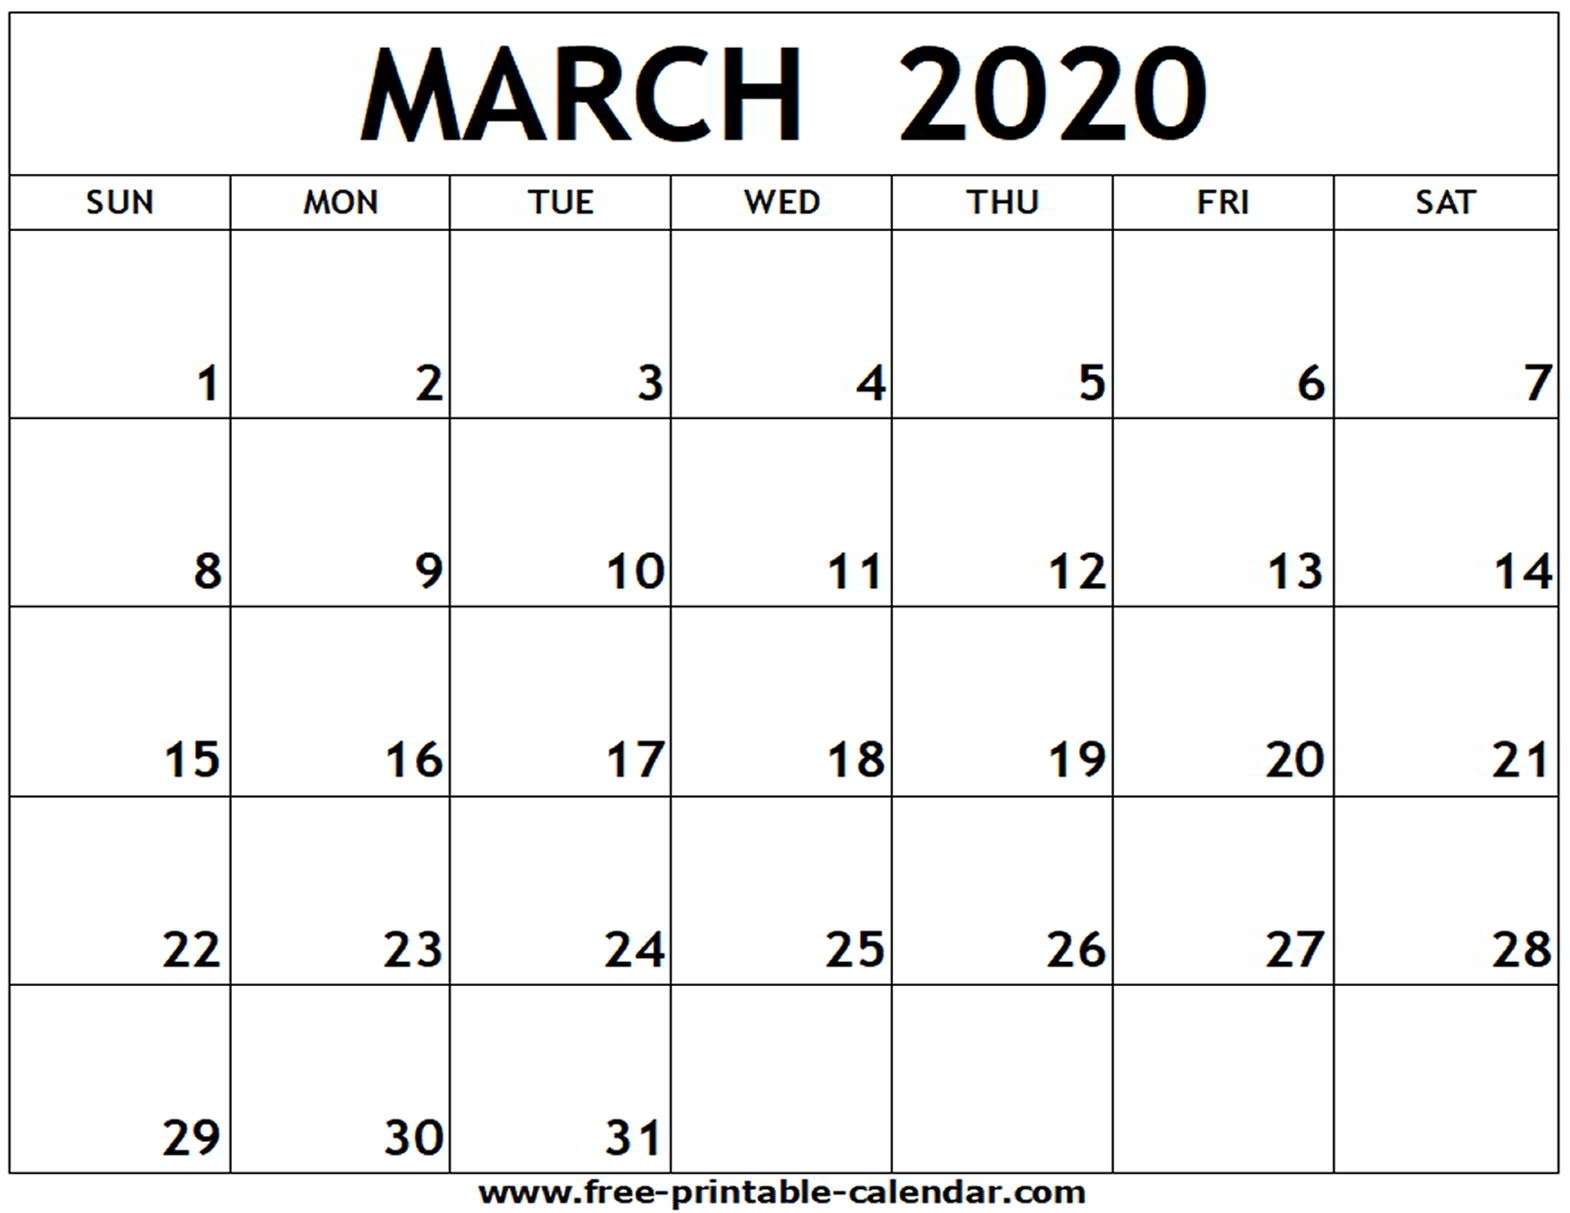 March 2020 Printable Calendar - Free-Printable-Calendar inside Download Free Printable 2020 Calendar